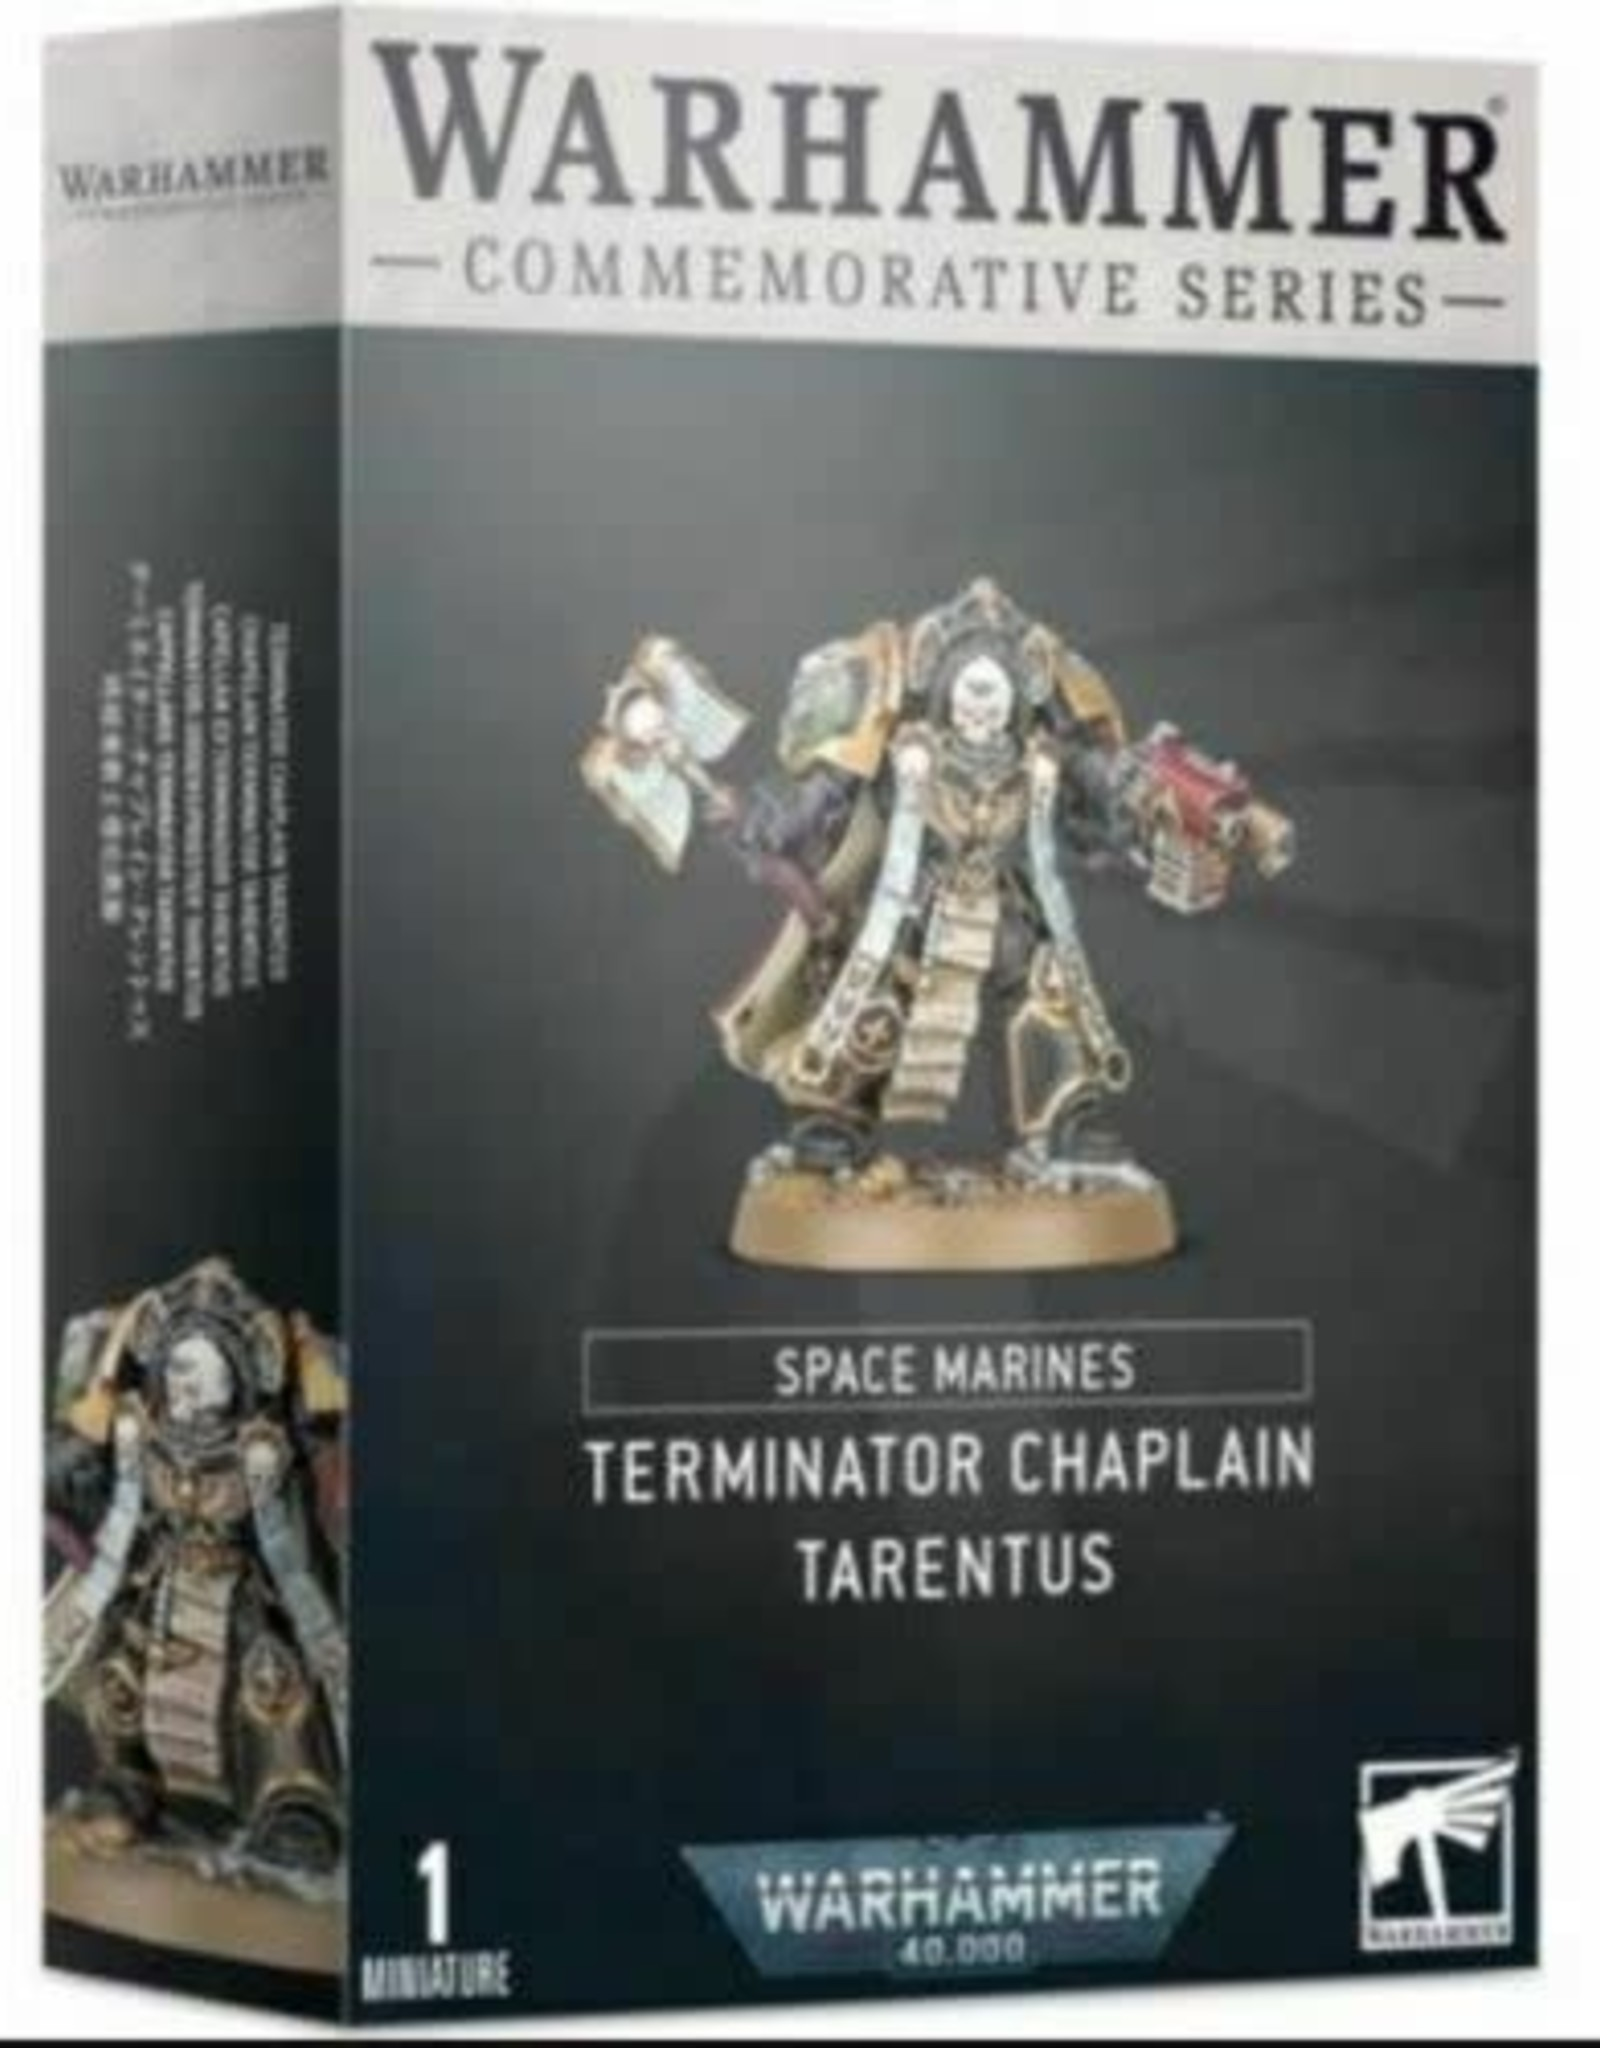 Games Workshop S/MARINES: TERMINATOR CHAPLAIN TARENTUS